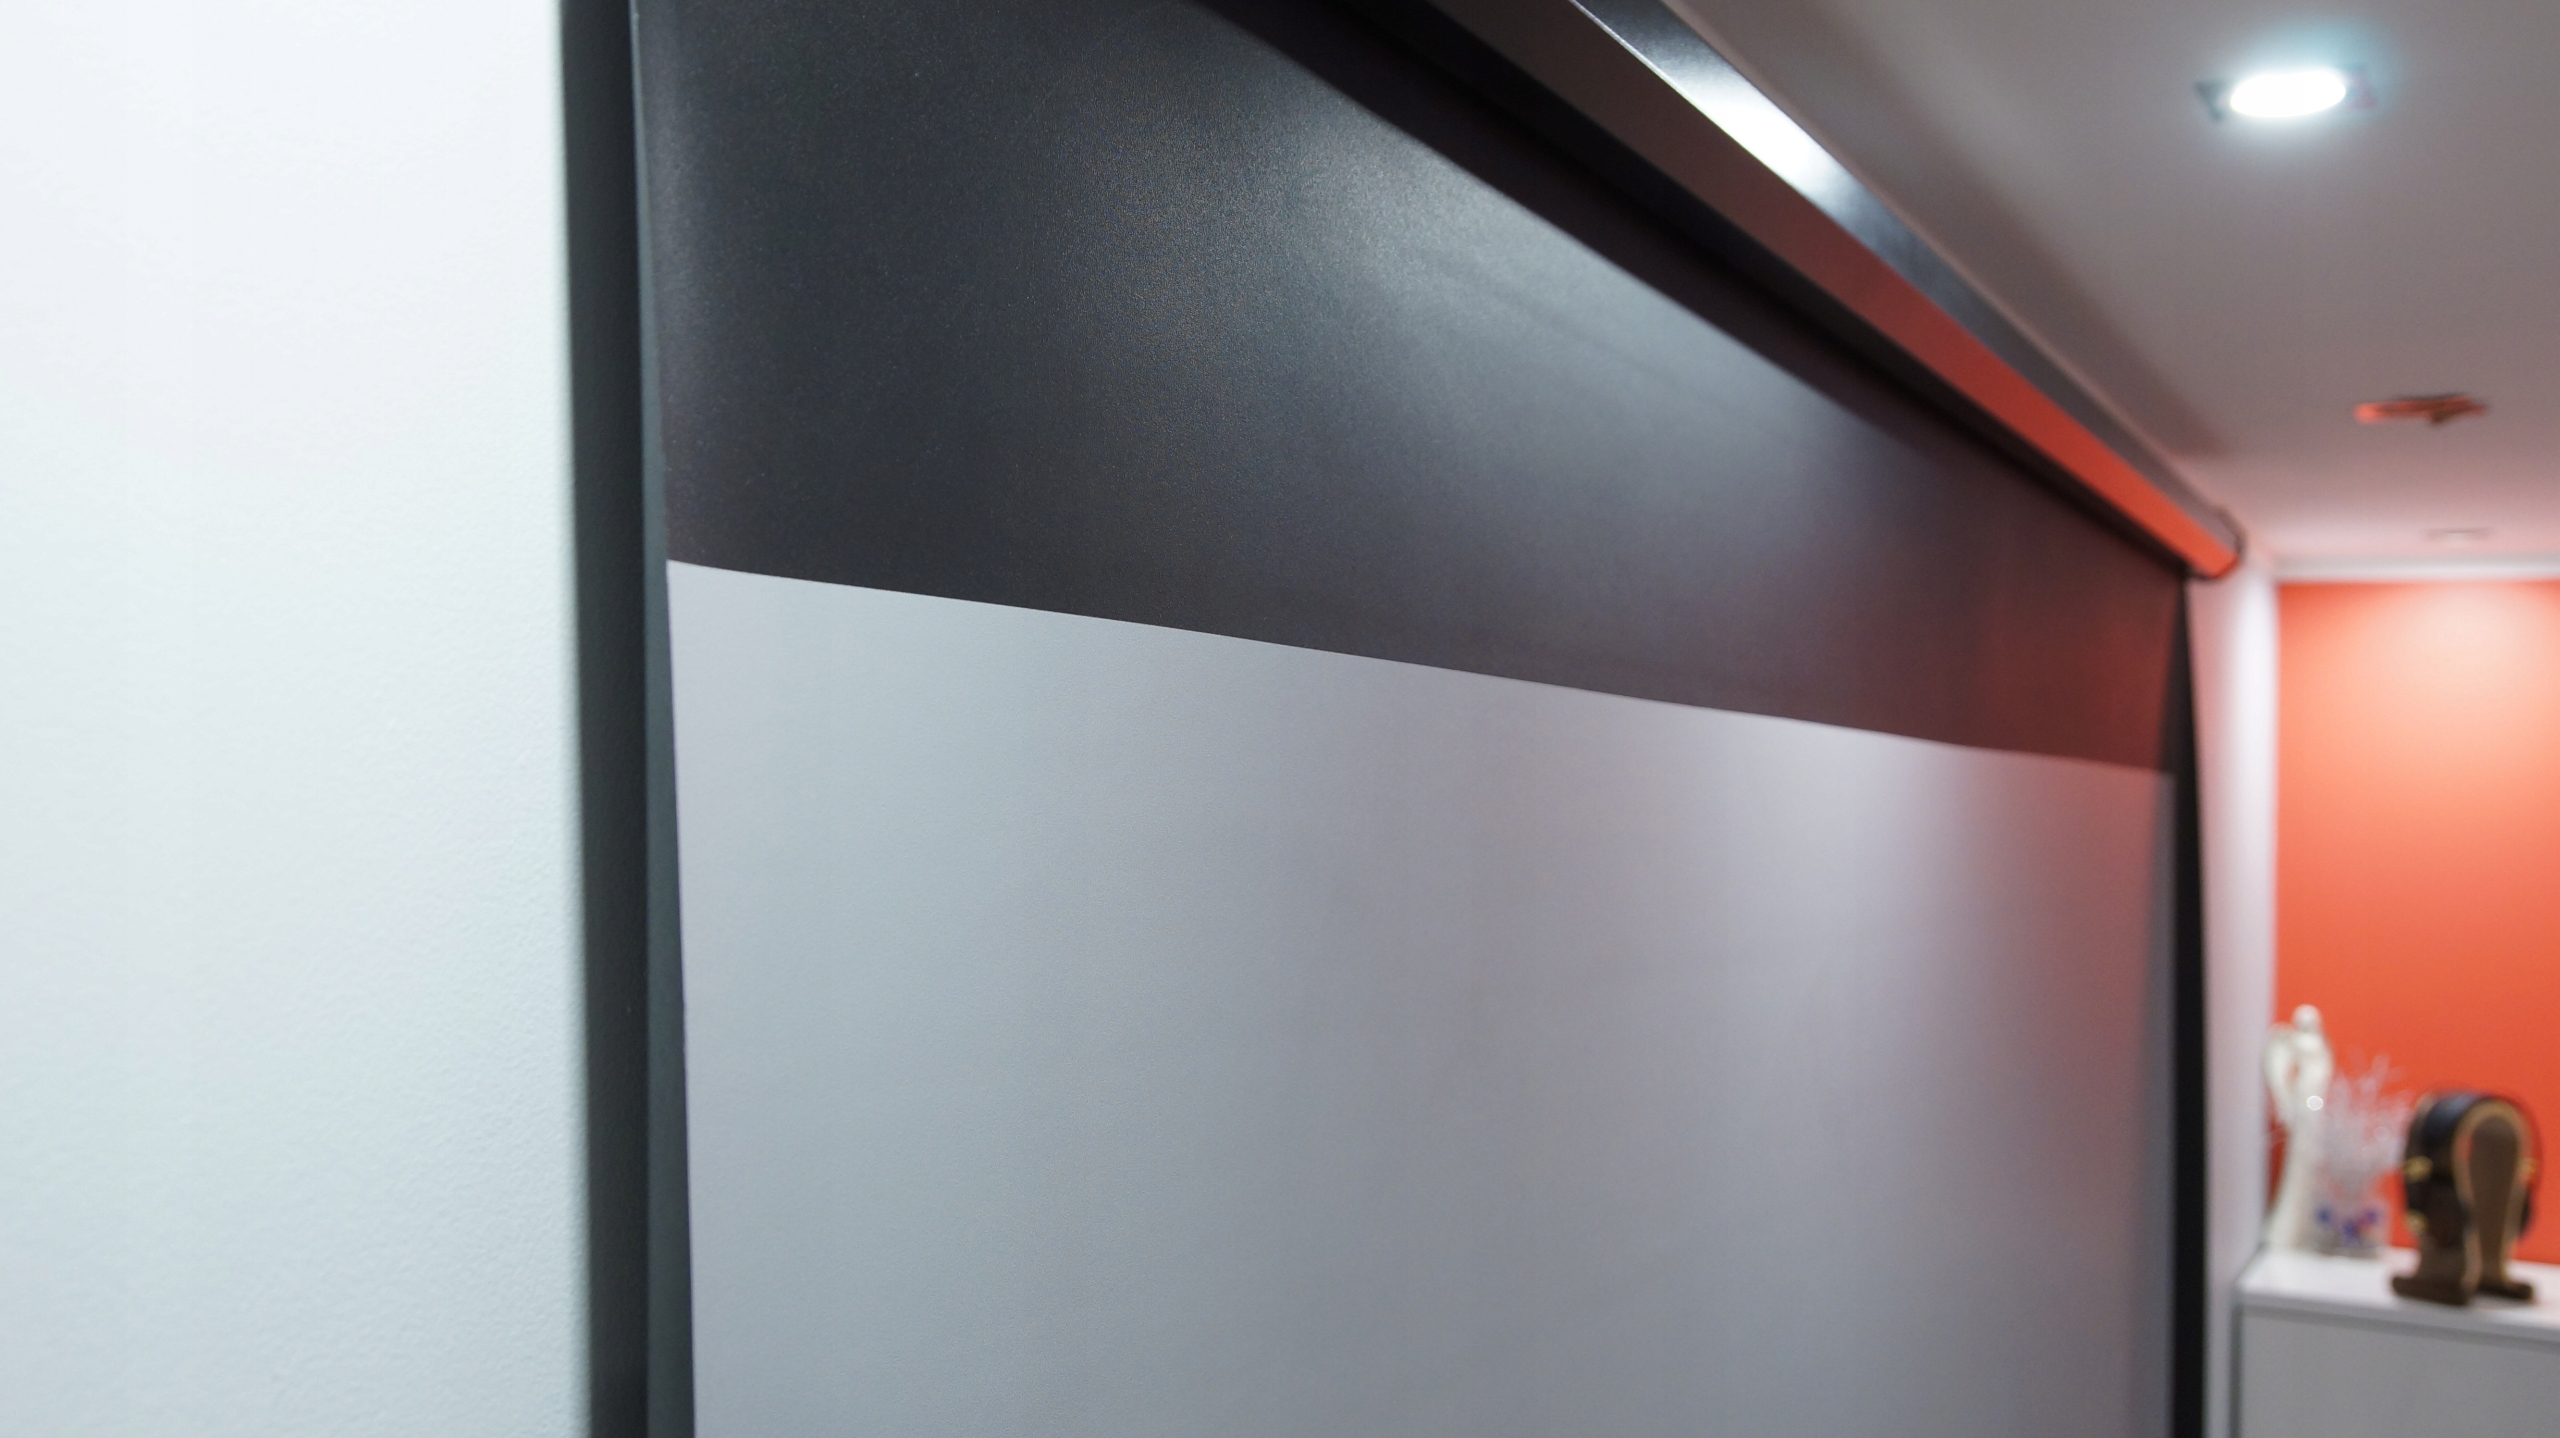 240x135 Ekran Projekcyjny Buenoscreen Cinema Hd Gr 7758930125